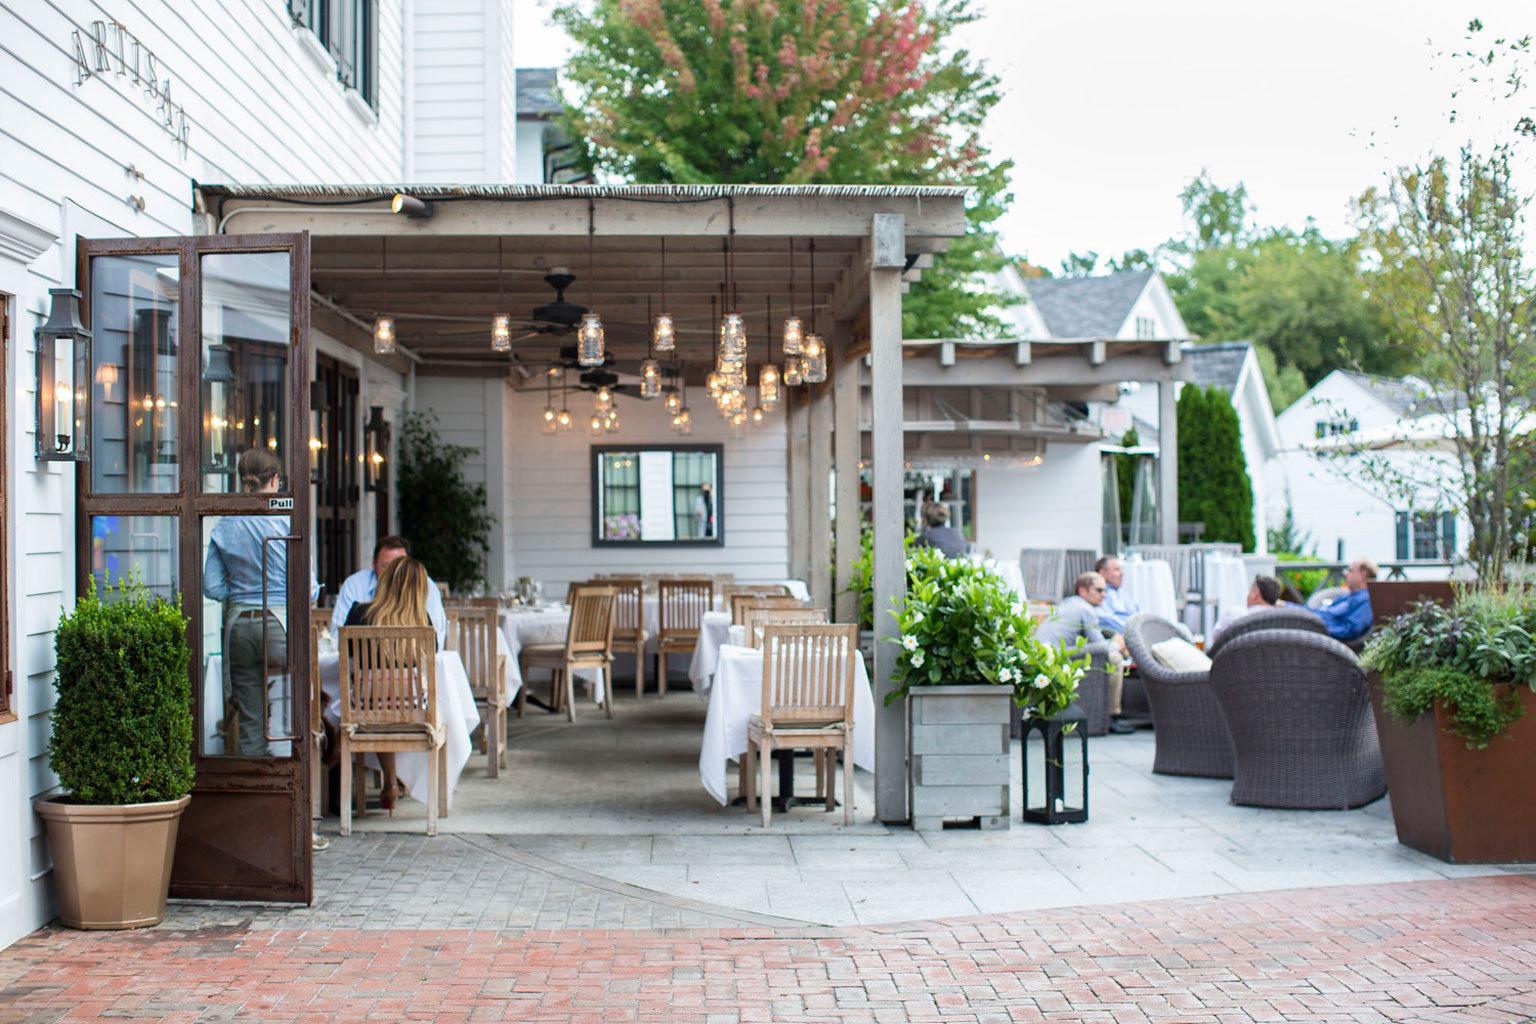 ground property home Courtyard restaurant outdoor structure backyard Resort cottage porch stone